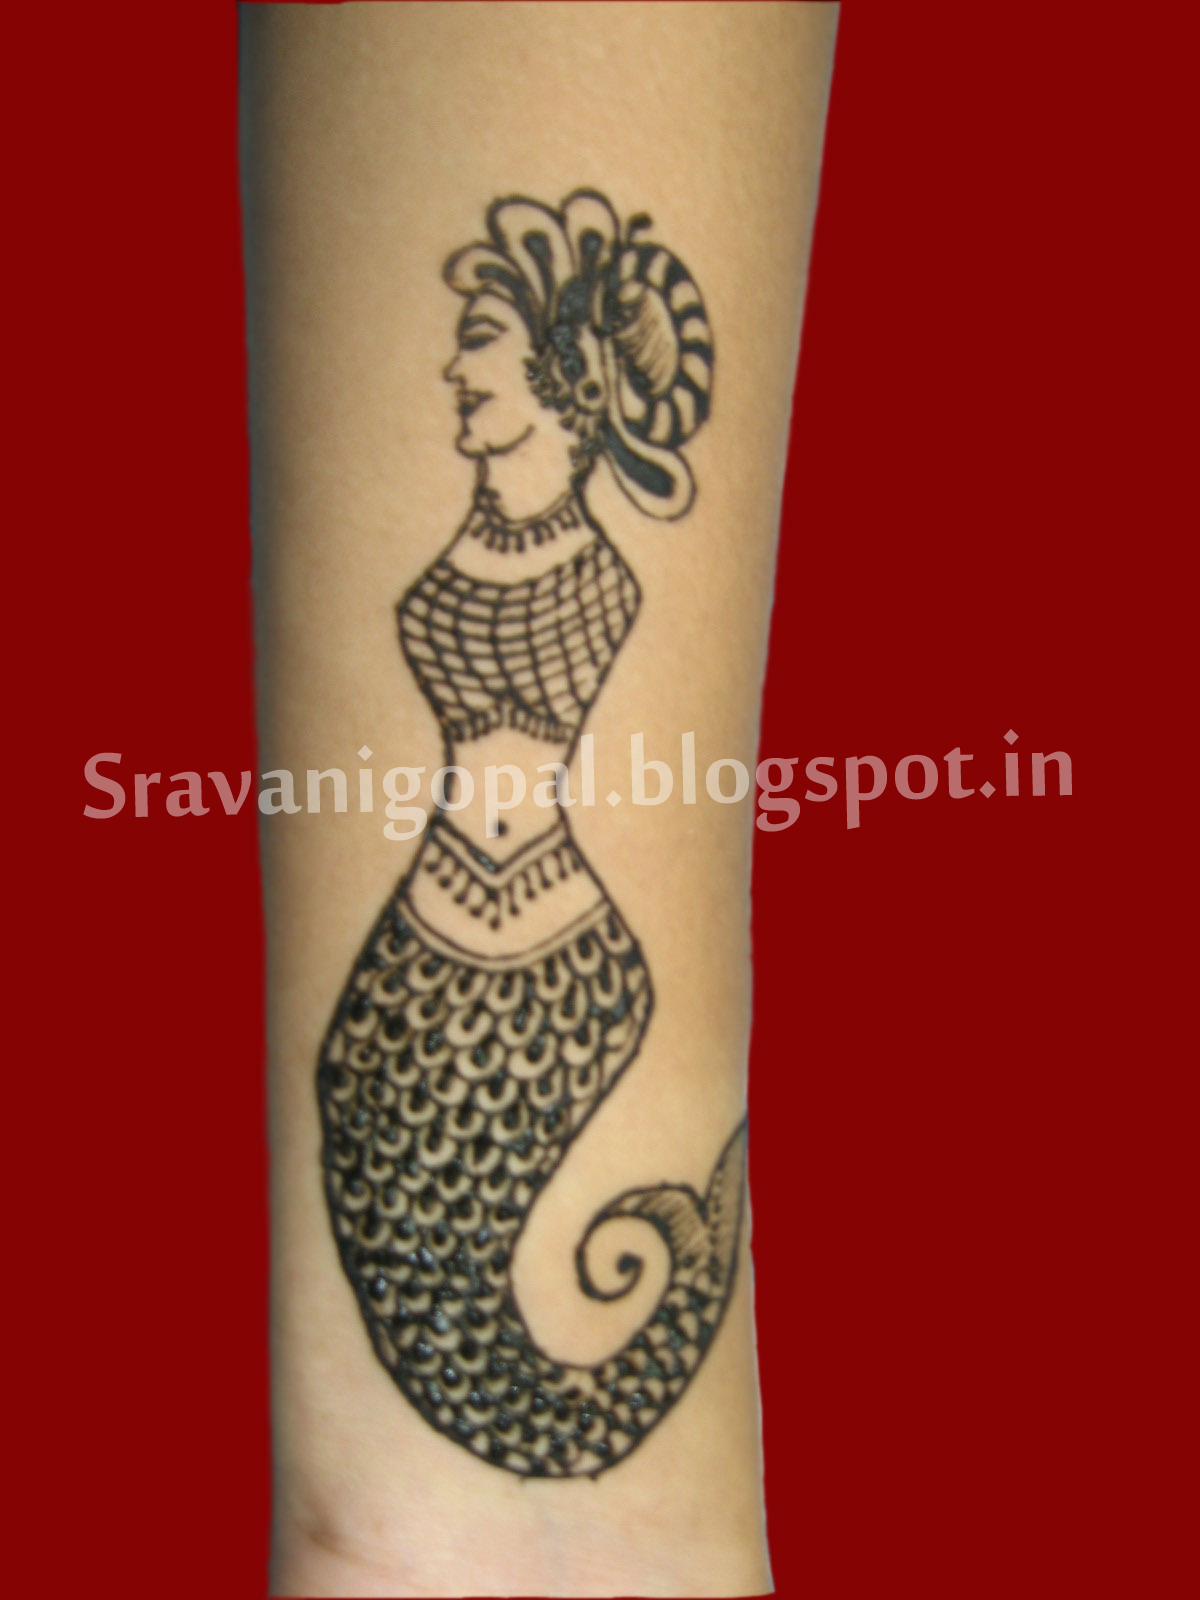 Arabic Mehndi For Right Hand : Sravani s arts crafts mehndi designs